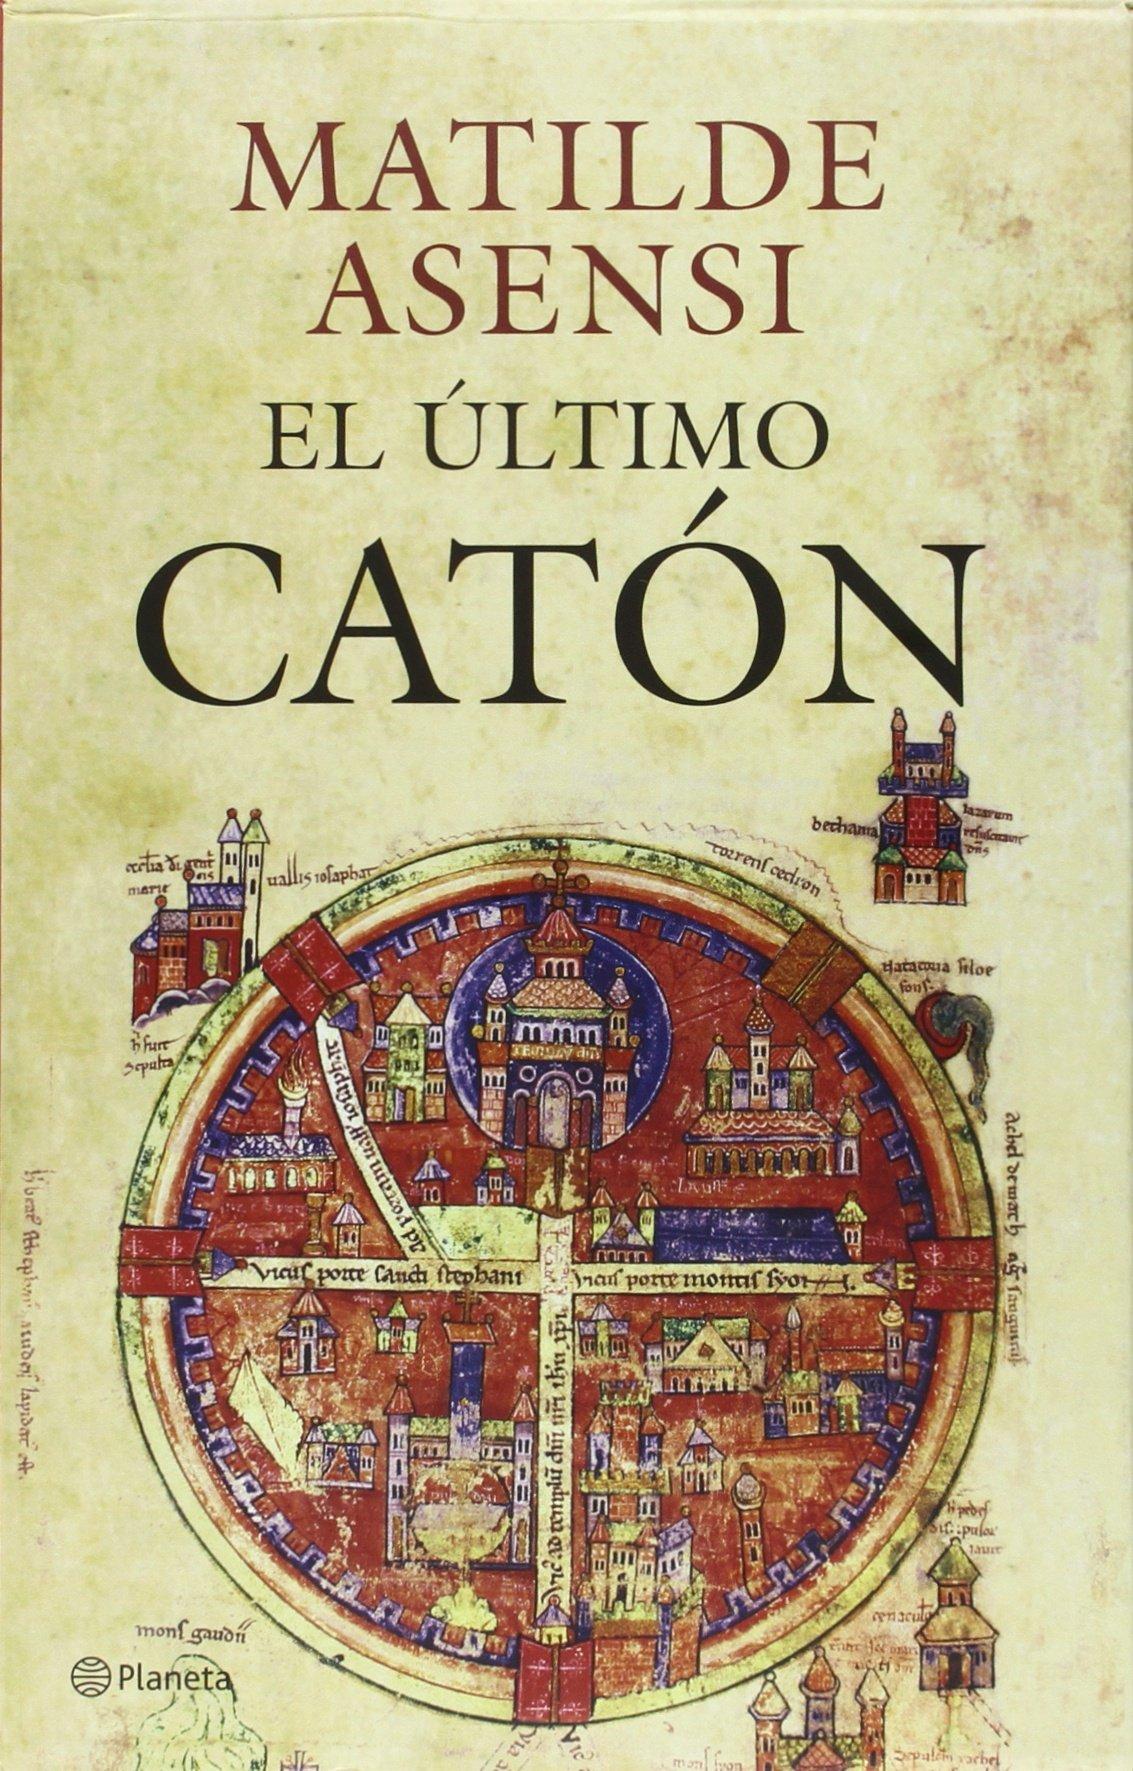 Amazon.com: ESTUCHE MATILDE ASENSI: EL ÚLTIMO CATÓN + EL ...